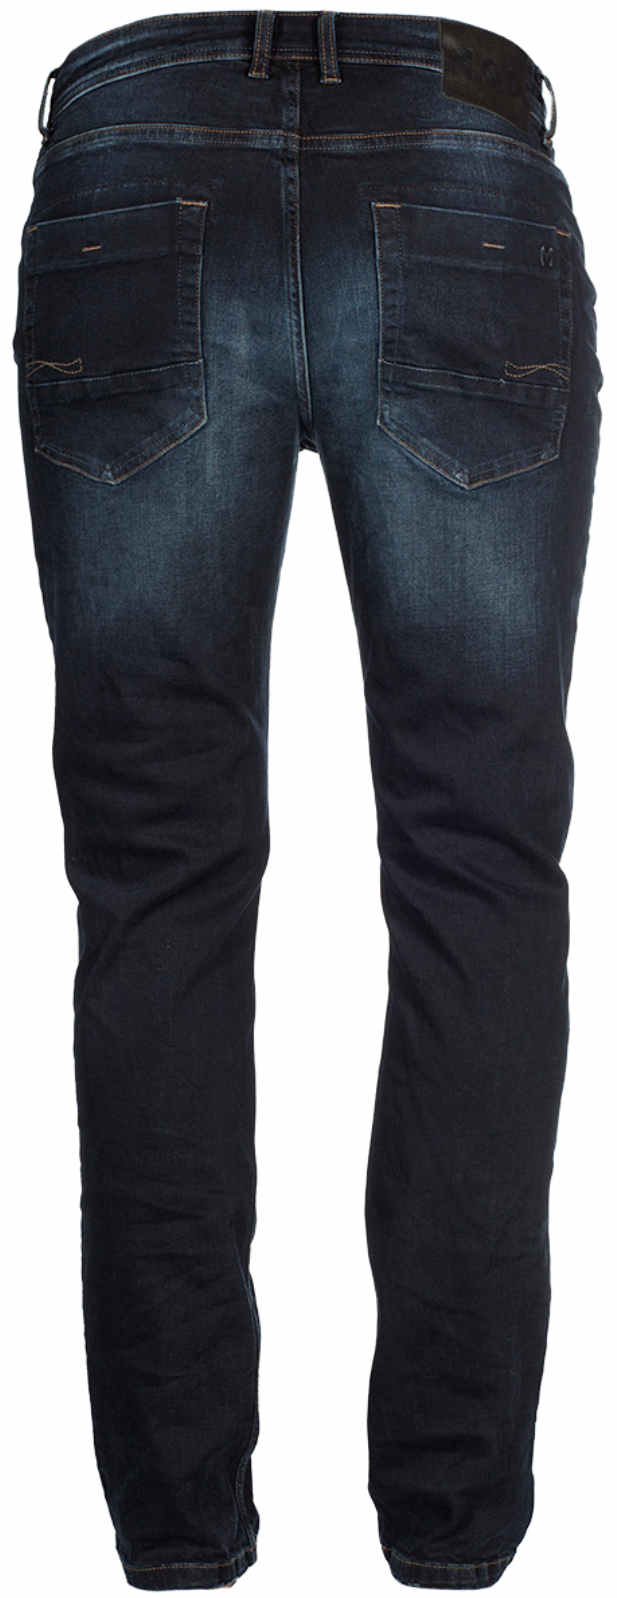 M.O.D Herren Jeans Cornell Slim NOS-1003 Hose Stretch NEU NEU NEU Slim Fit Leg Denim MOD   Elegant und feierlich  327a3f